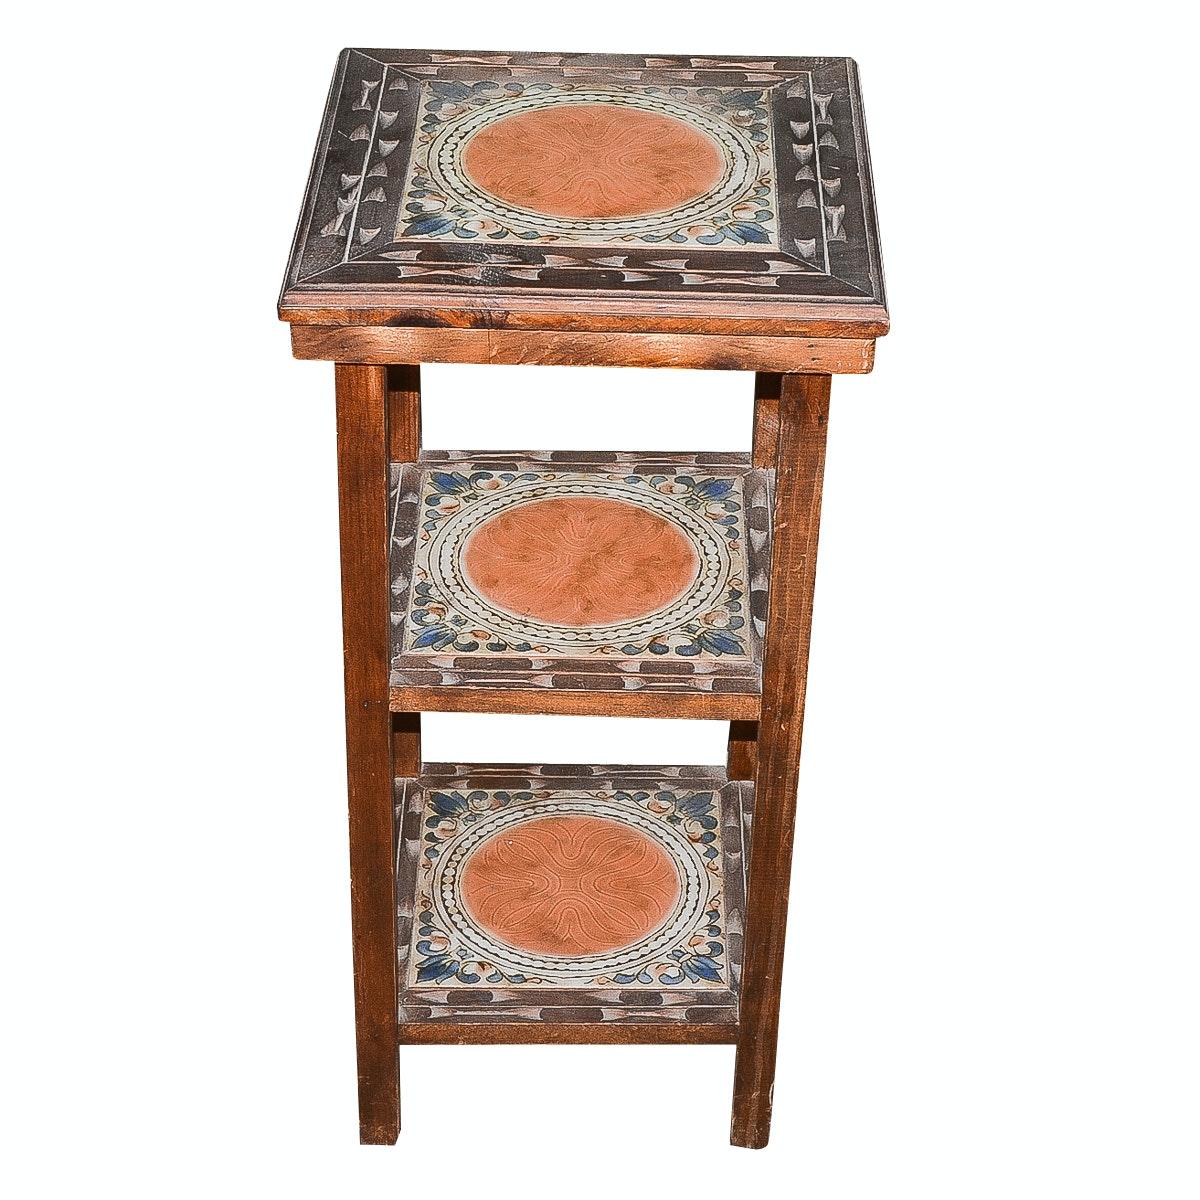 Vintage Italian Tile Accent Table